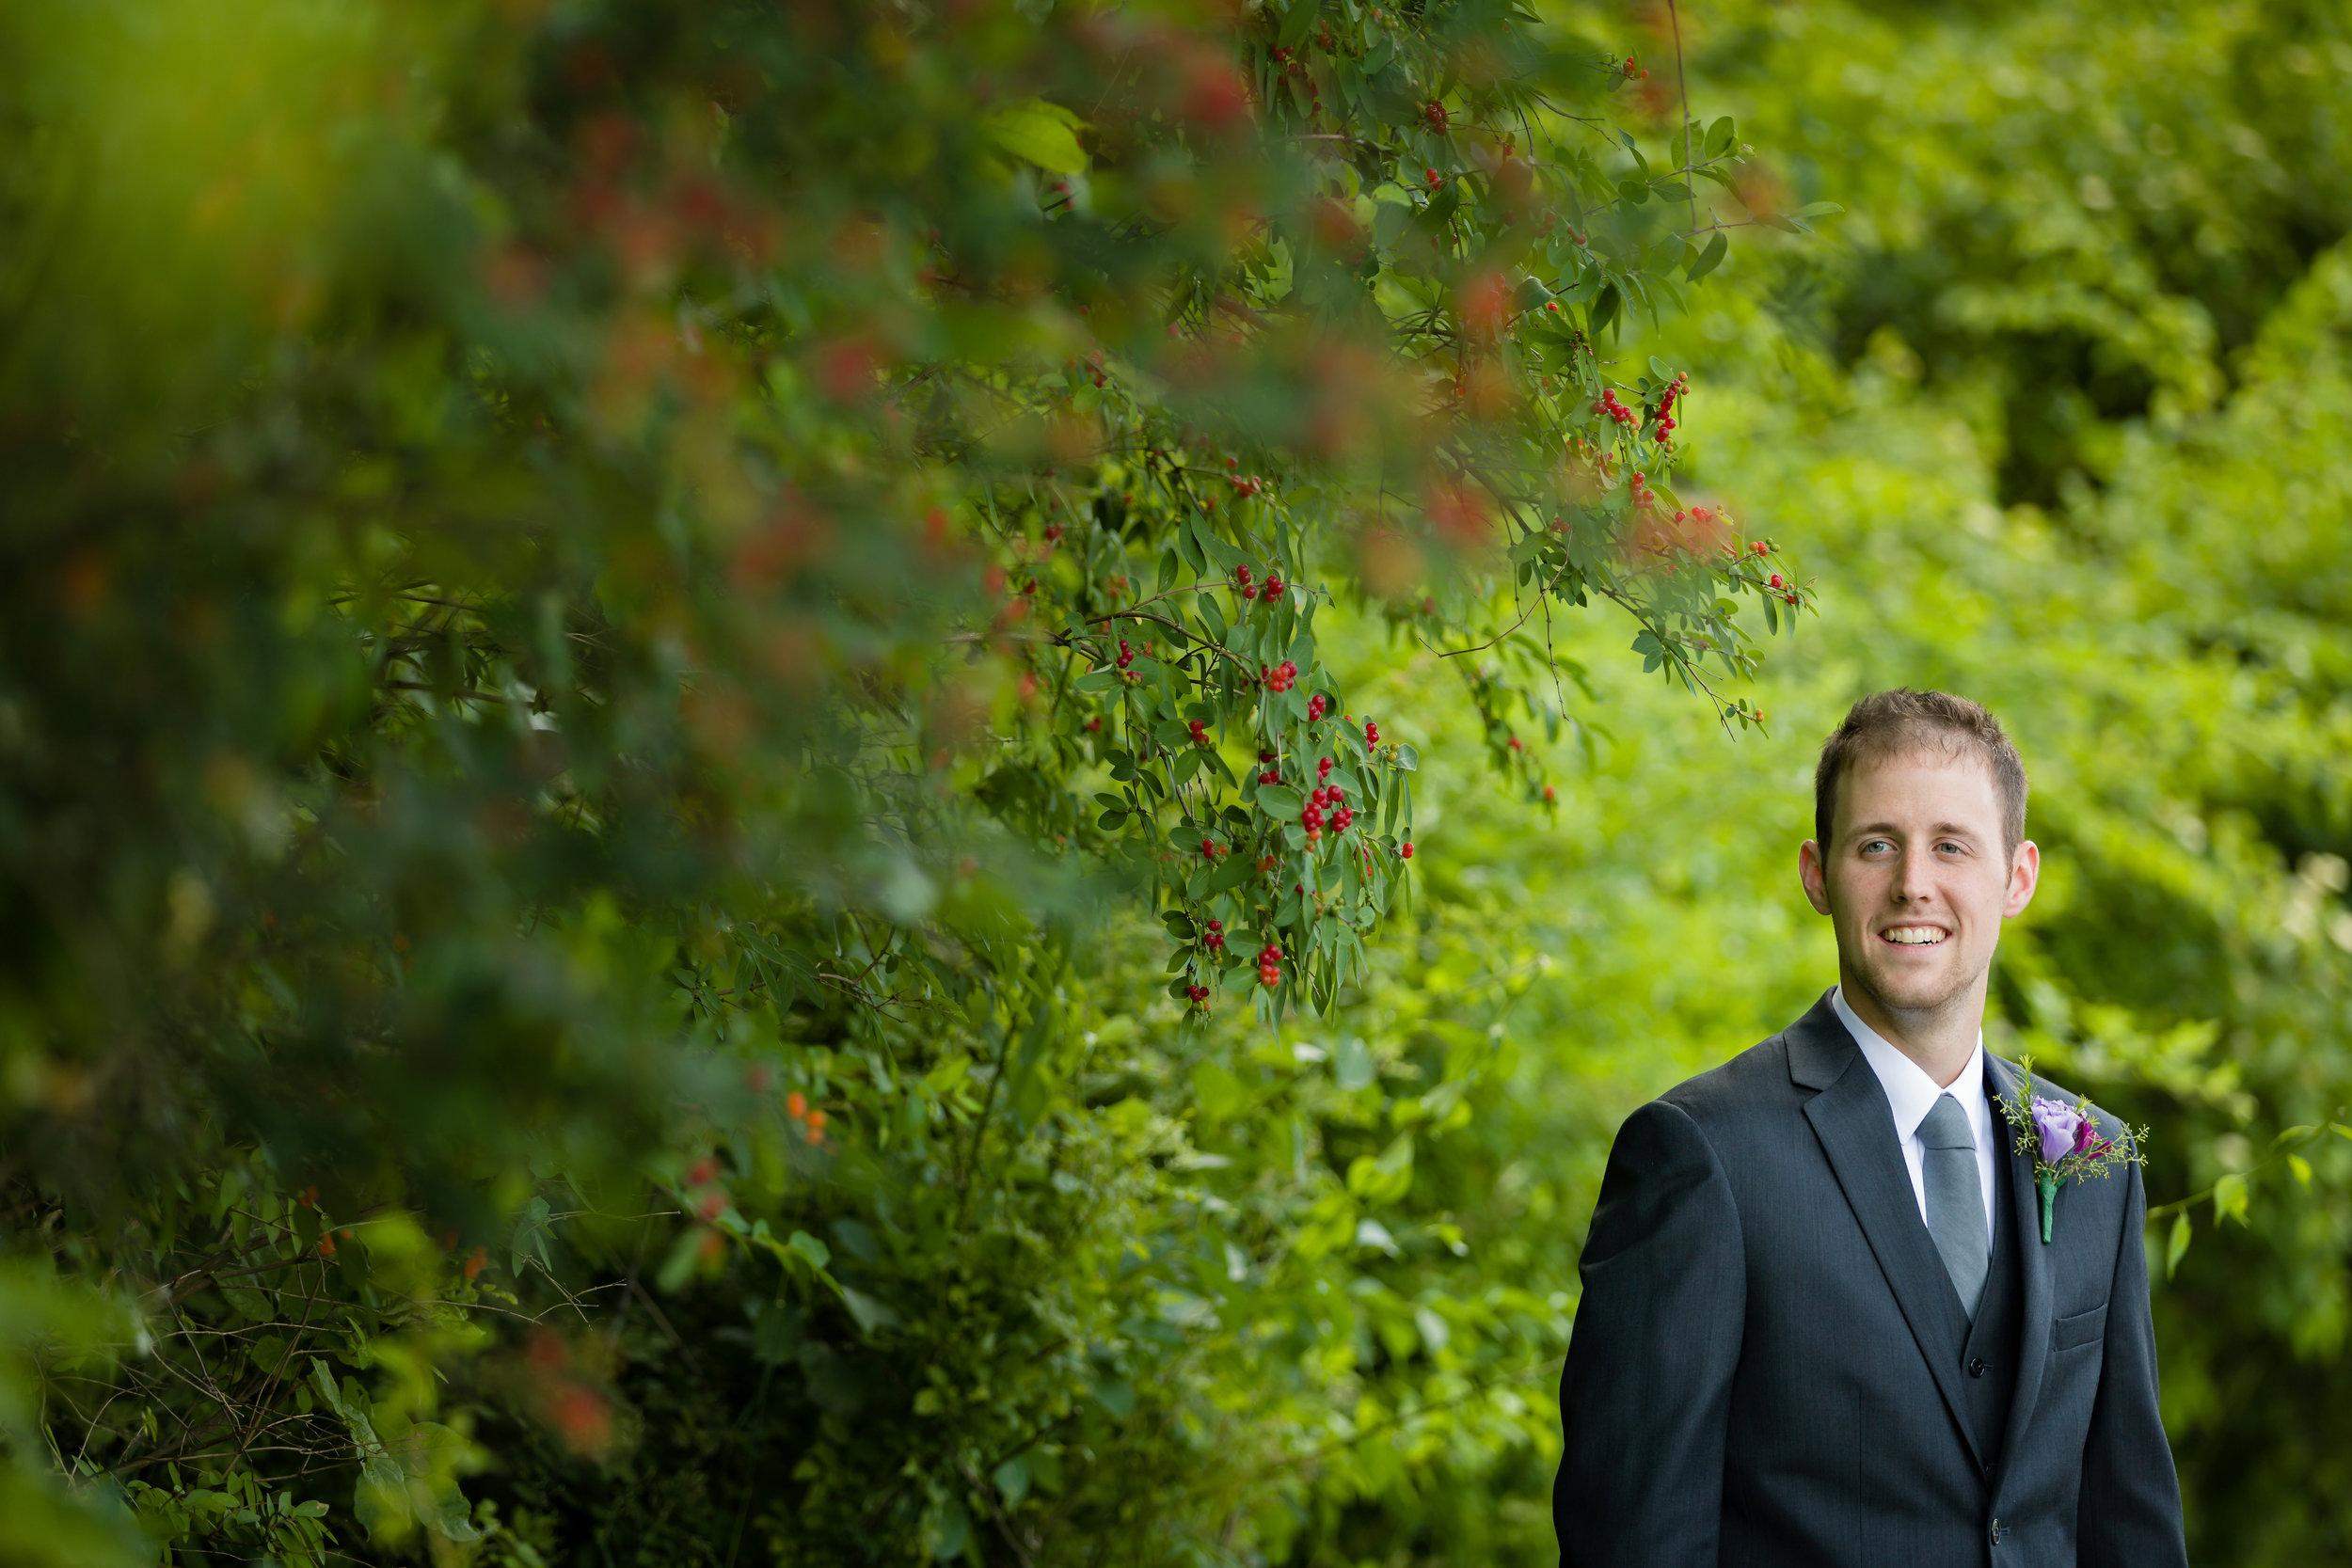 Groomsman Suit Rentals - Pittsburgh Wedding Venue - Duquesne University Wedding